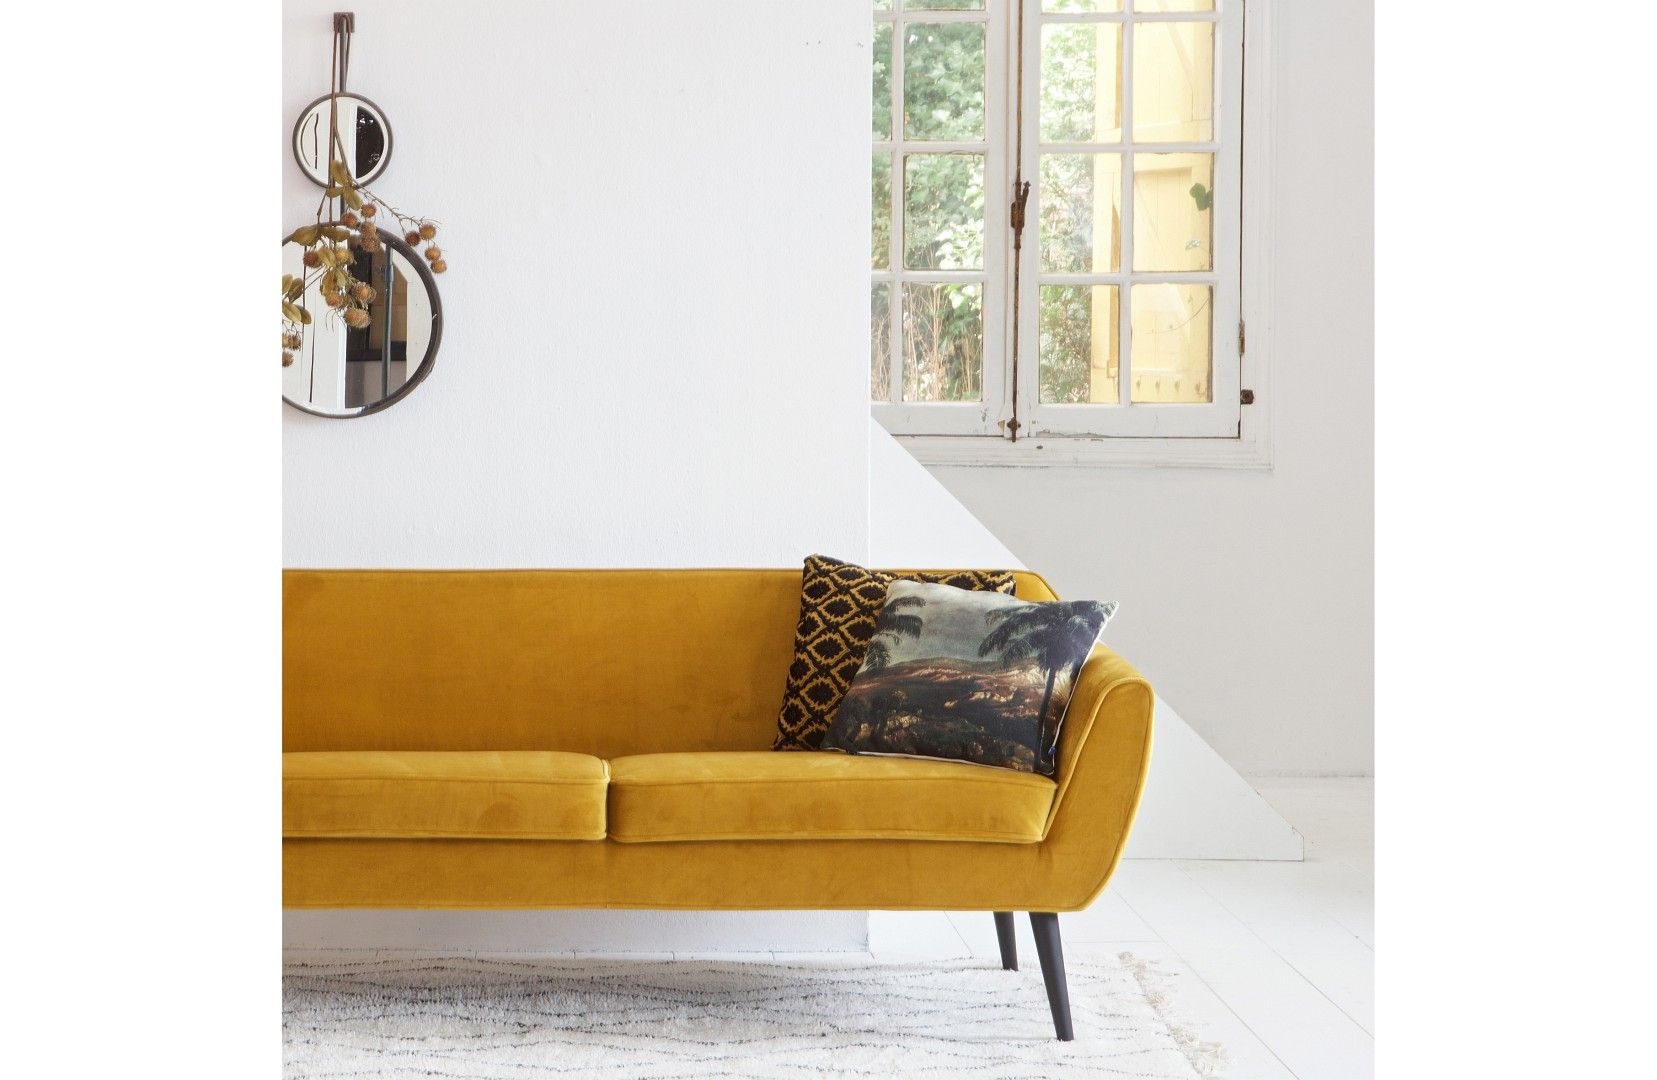 Retro Sofa Rocco Samt Ocker 3-Sitzer | Retro sofa, Retro und Der stil